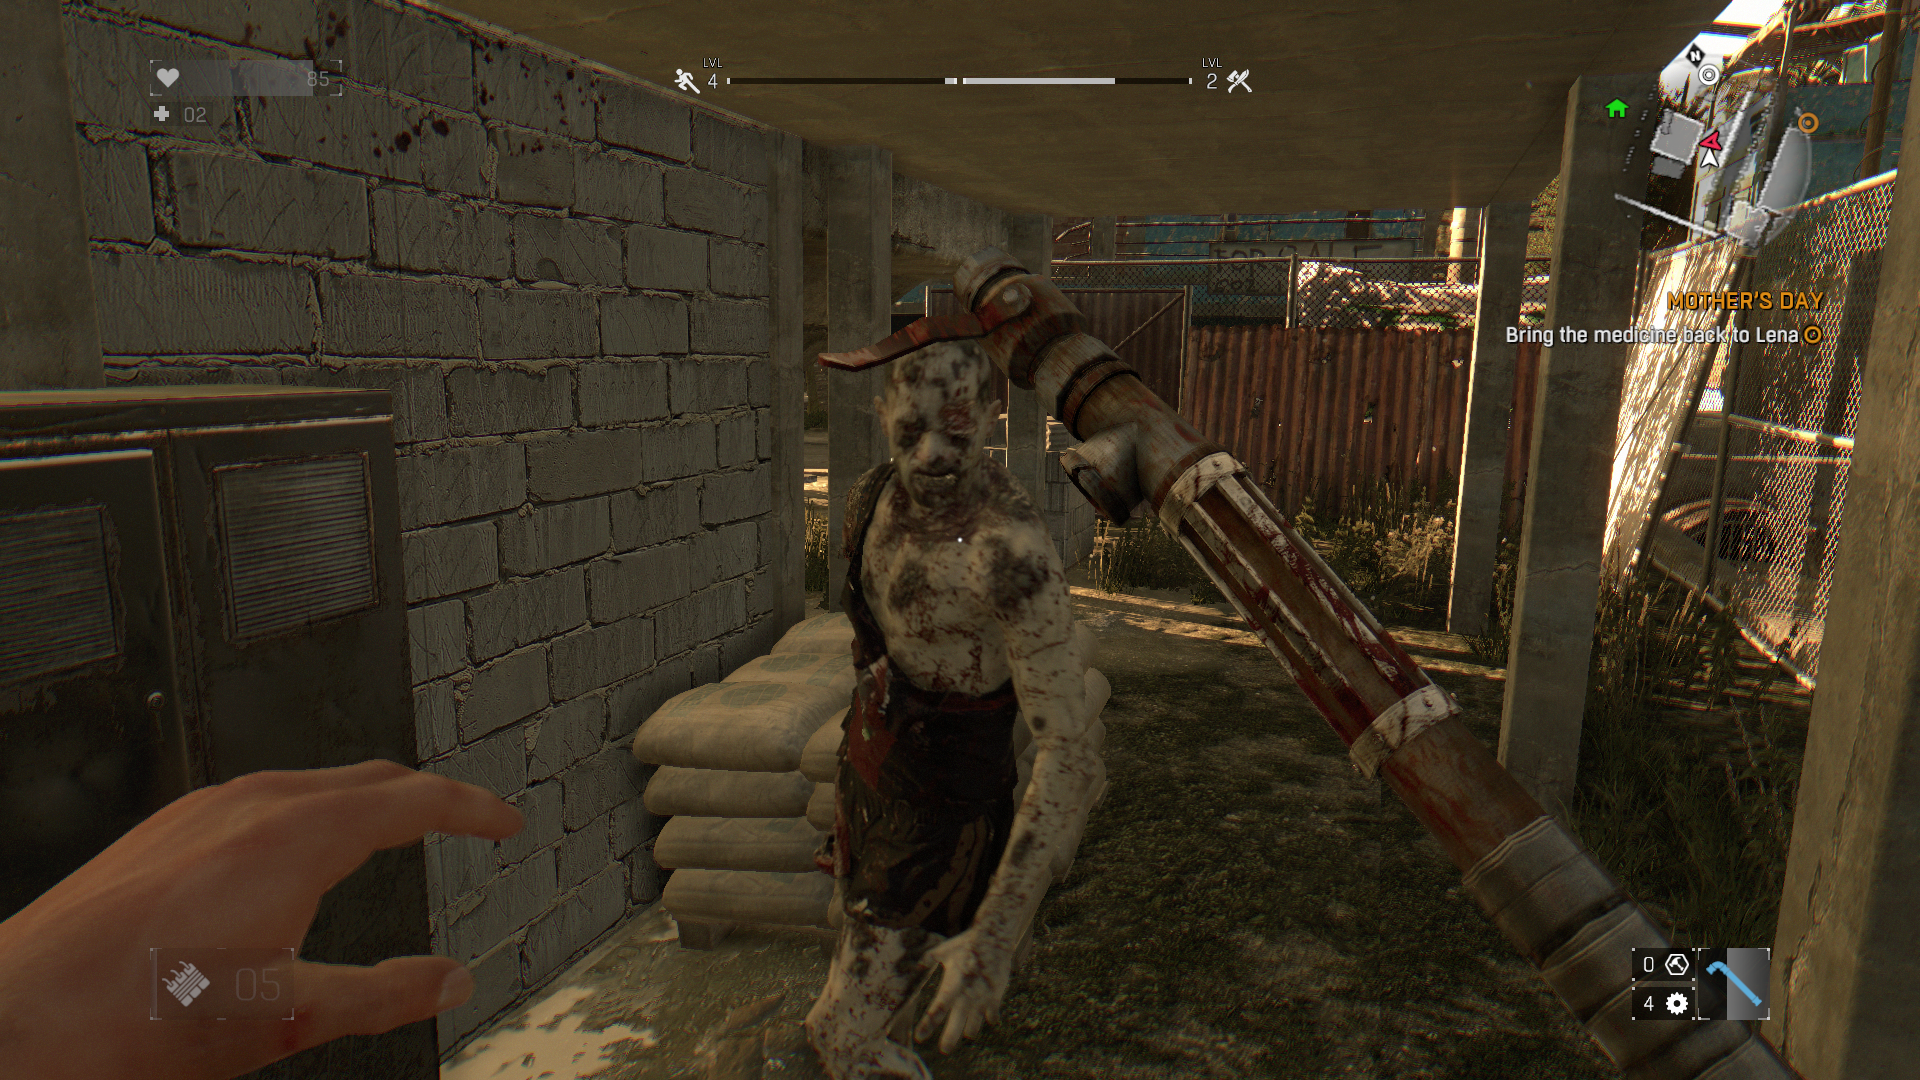 dying_light_review_N2_screenshot_PC (10)